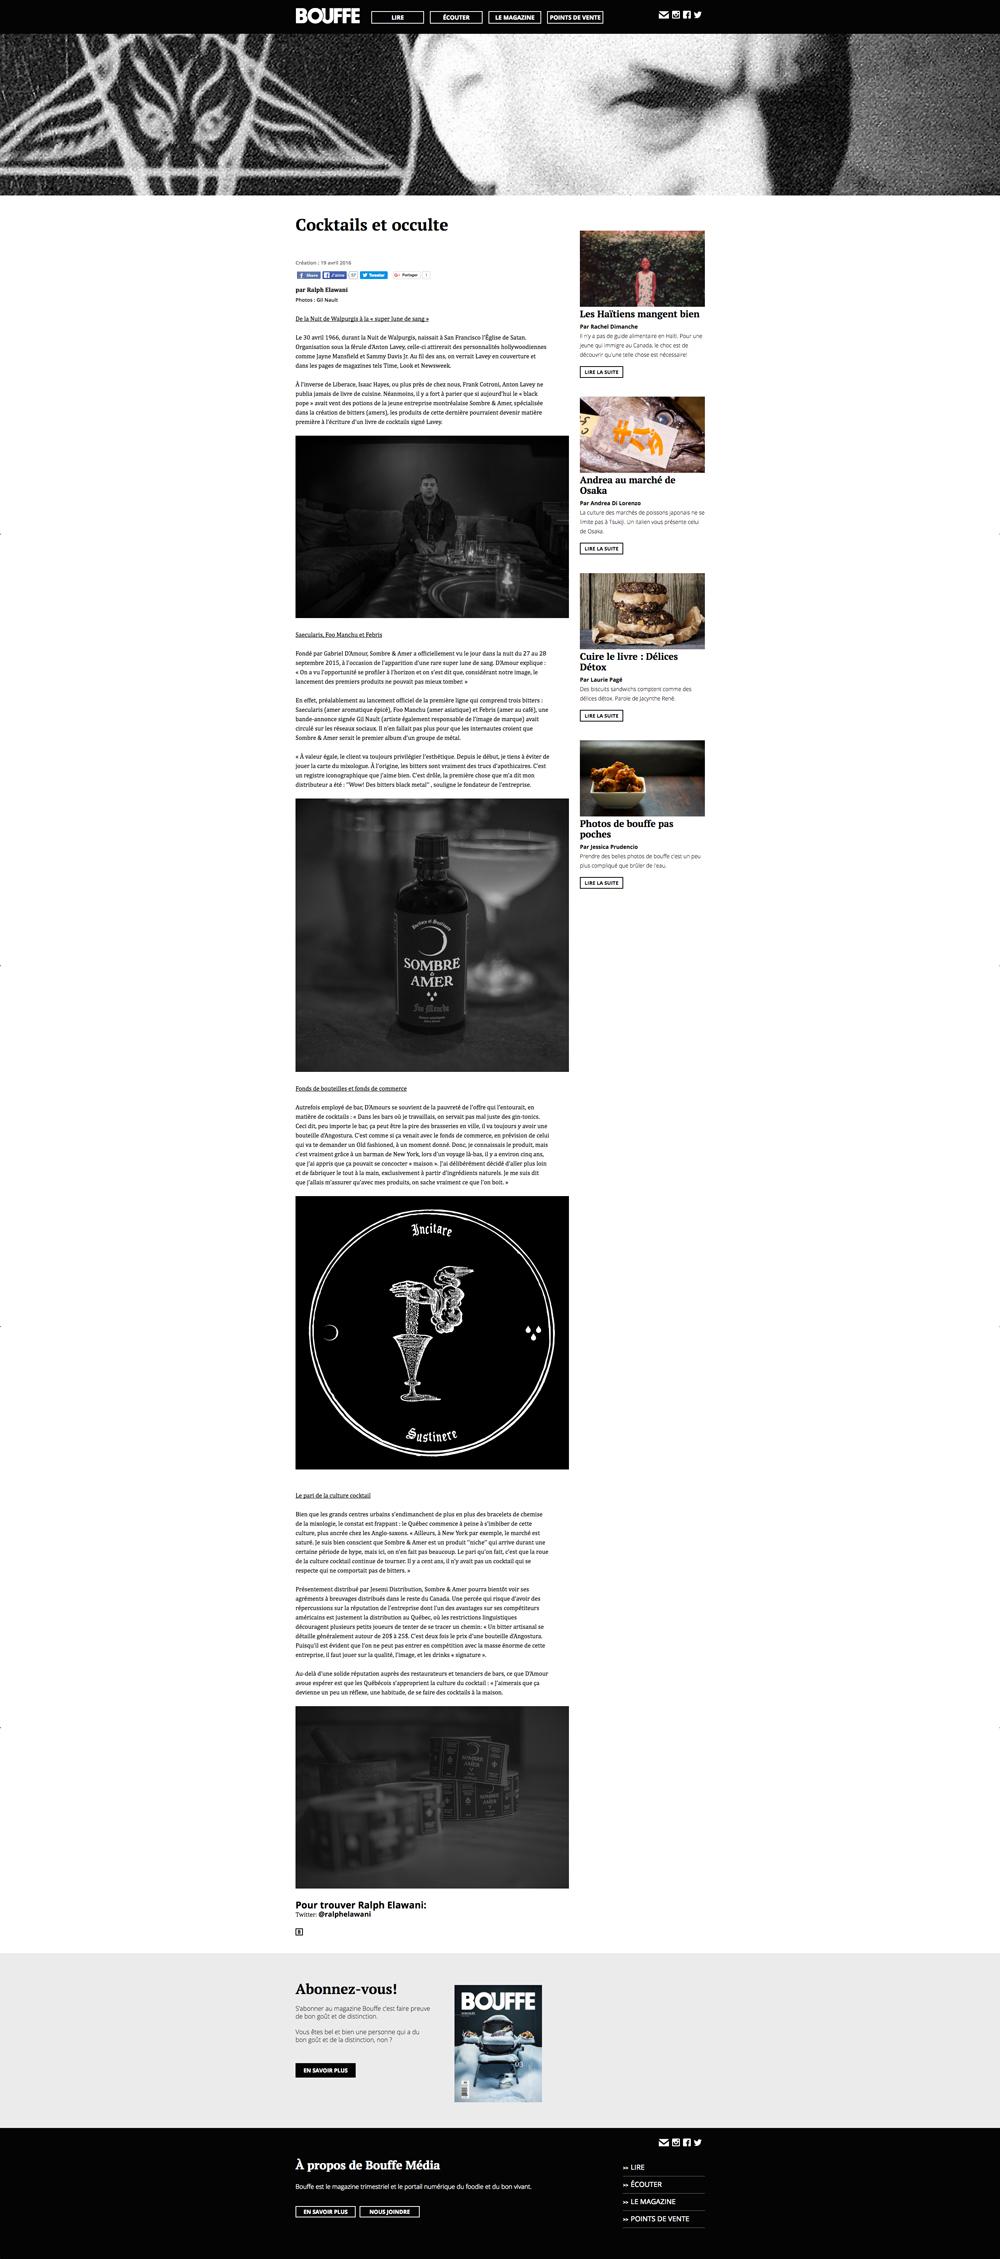 SOMBRE & AMER par RALPH ELAWANI dans le magazine BOUFFE, mai MMXVI